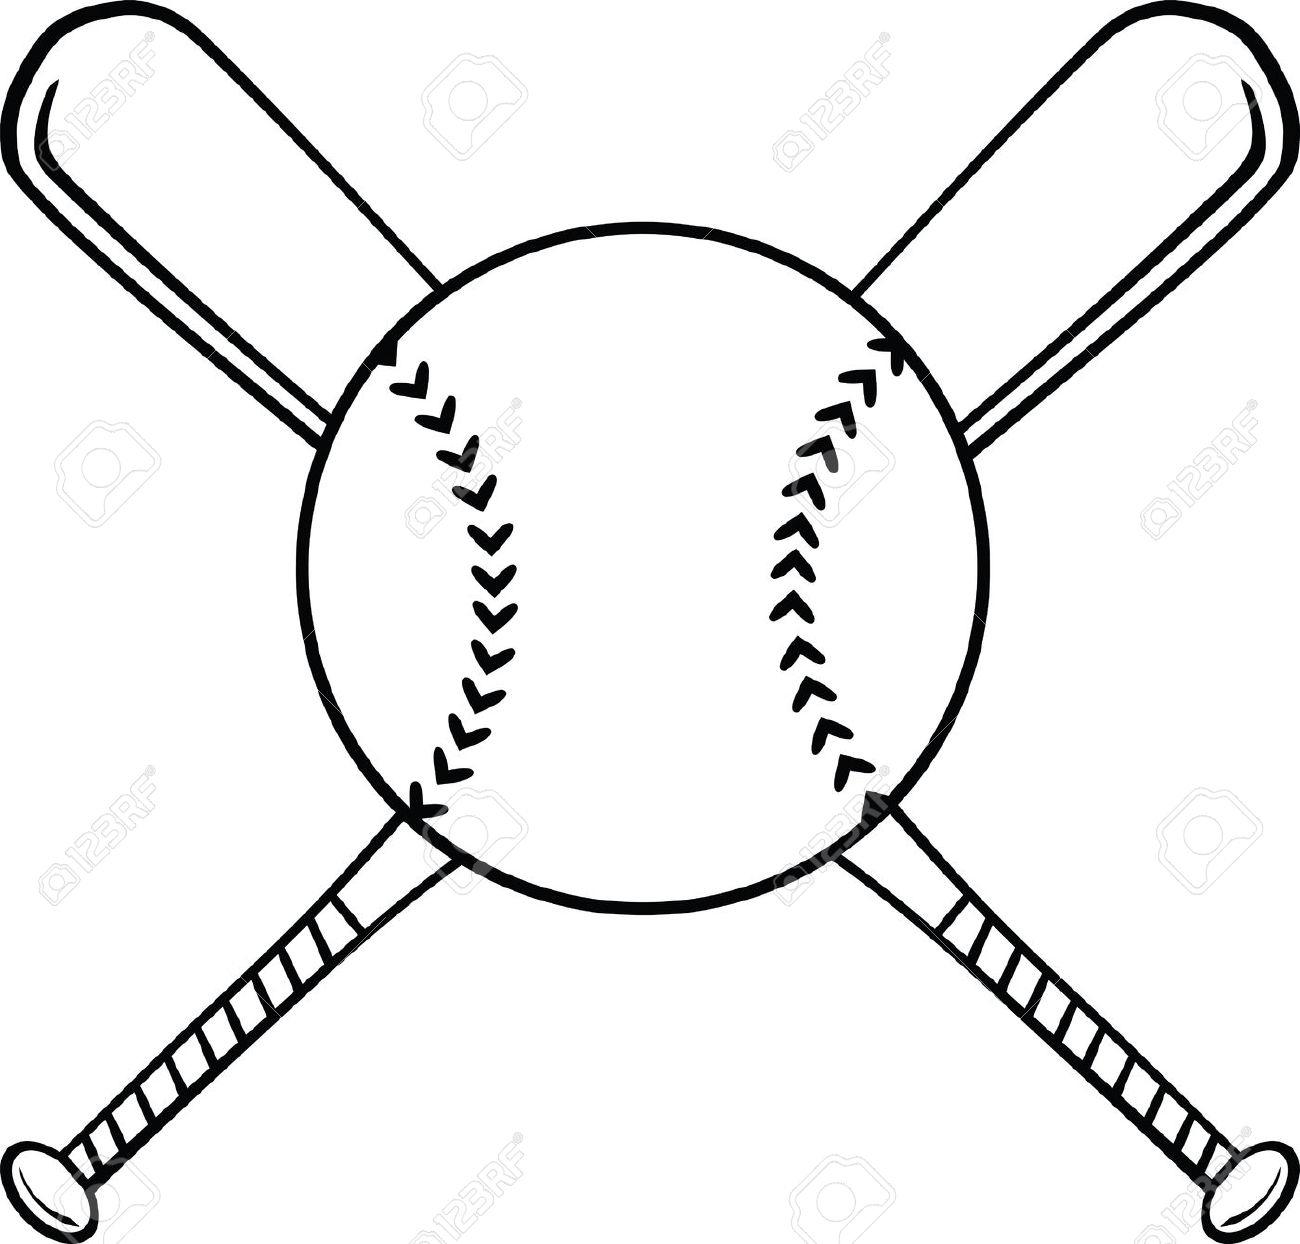 Fresh and white gallery. Black clipart baseball